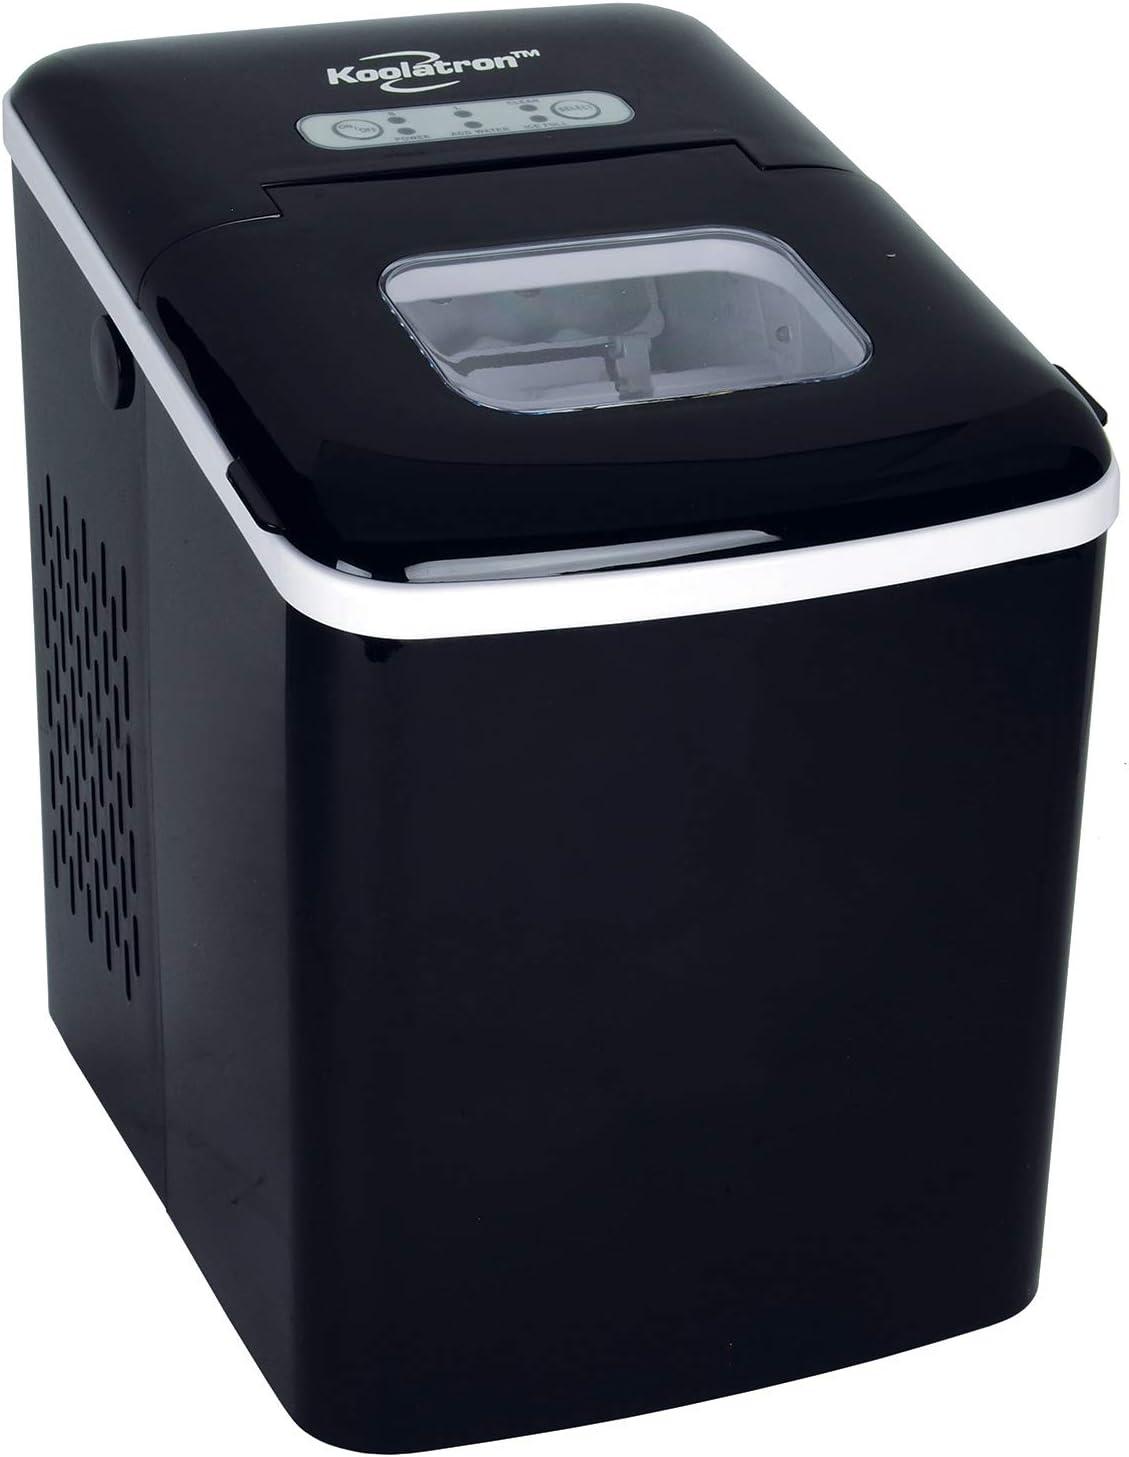 Koolatron KIM26B Ice maker